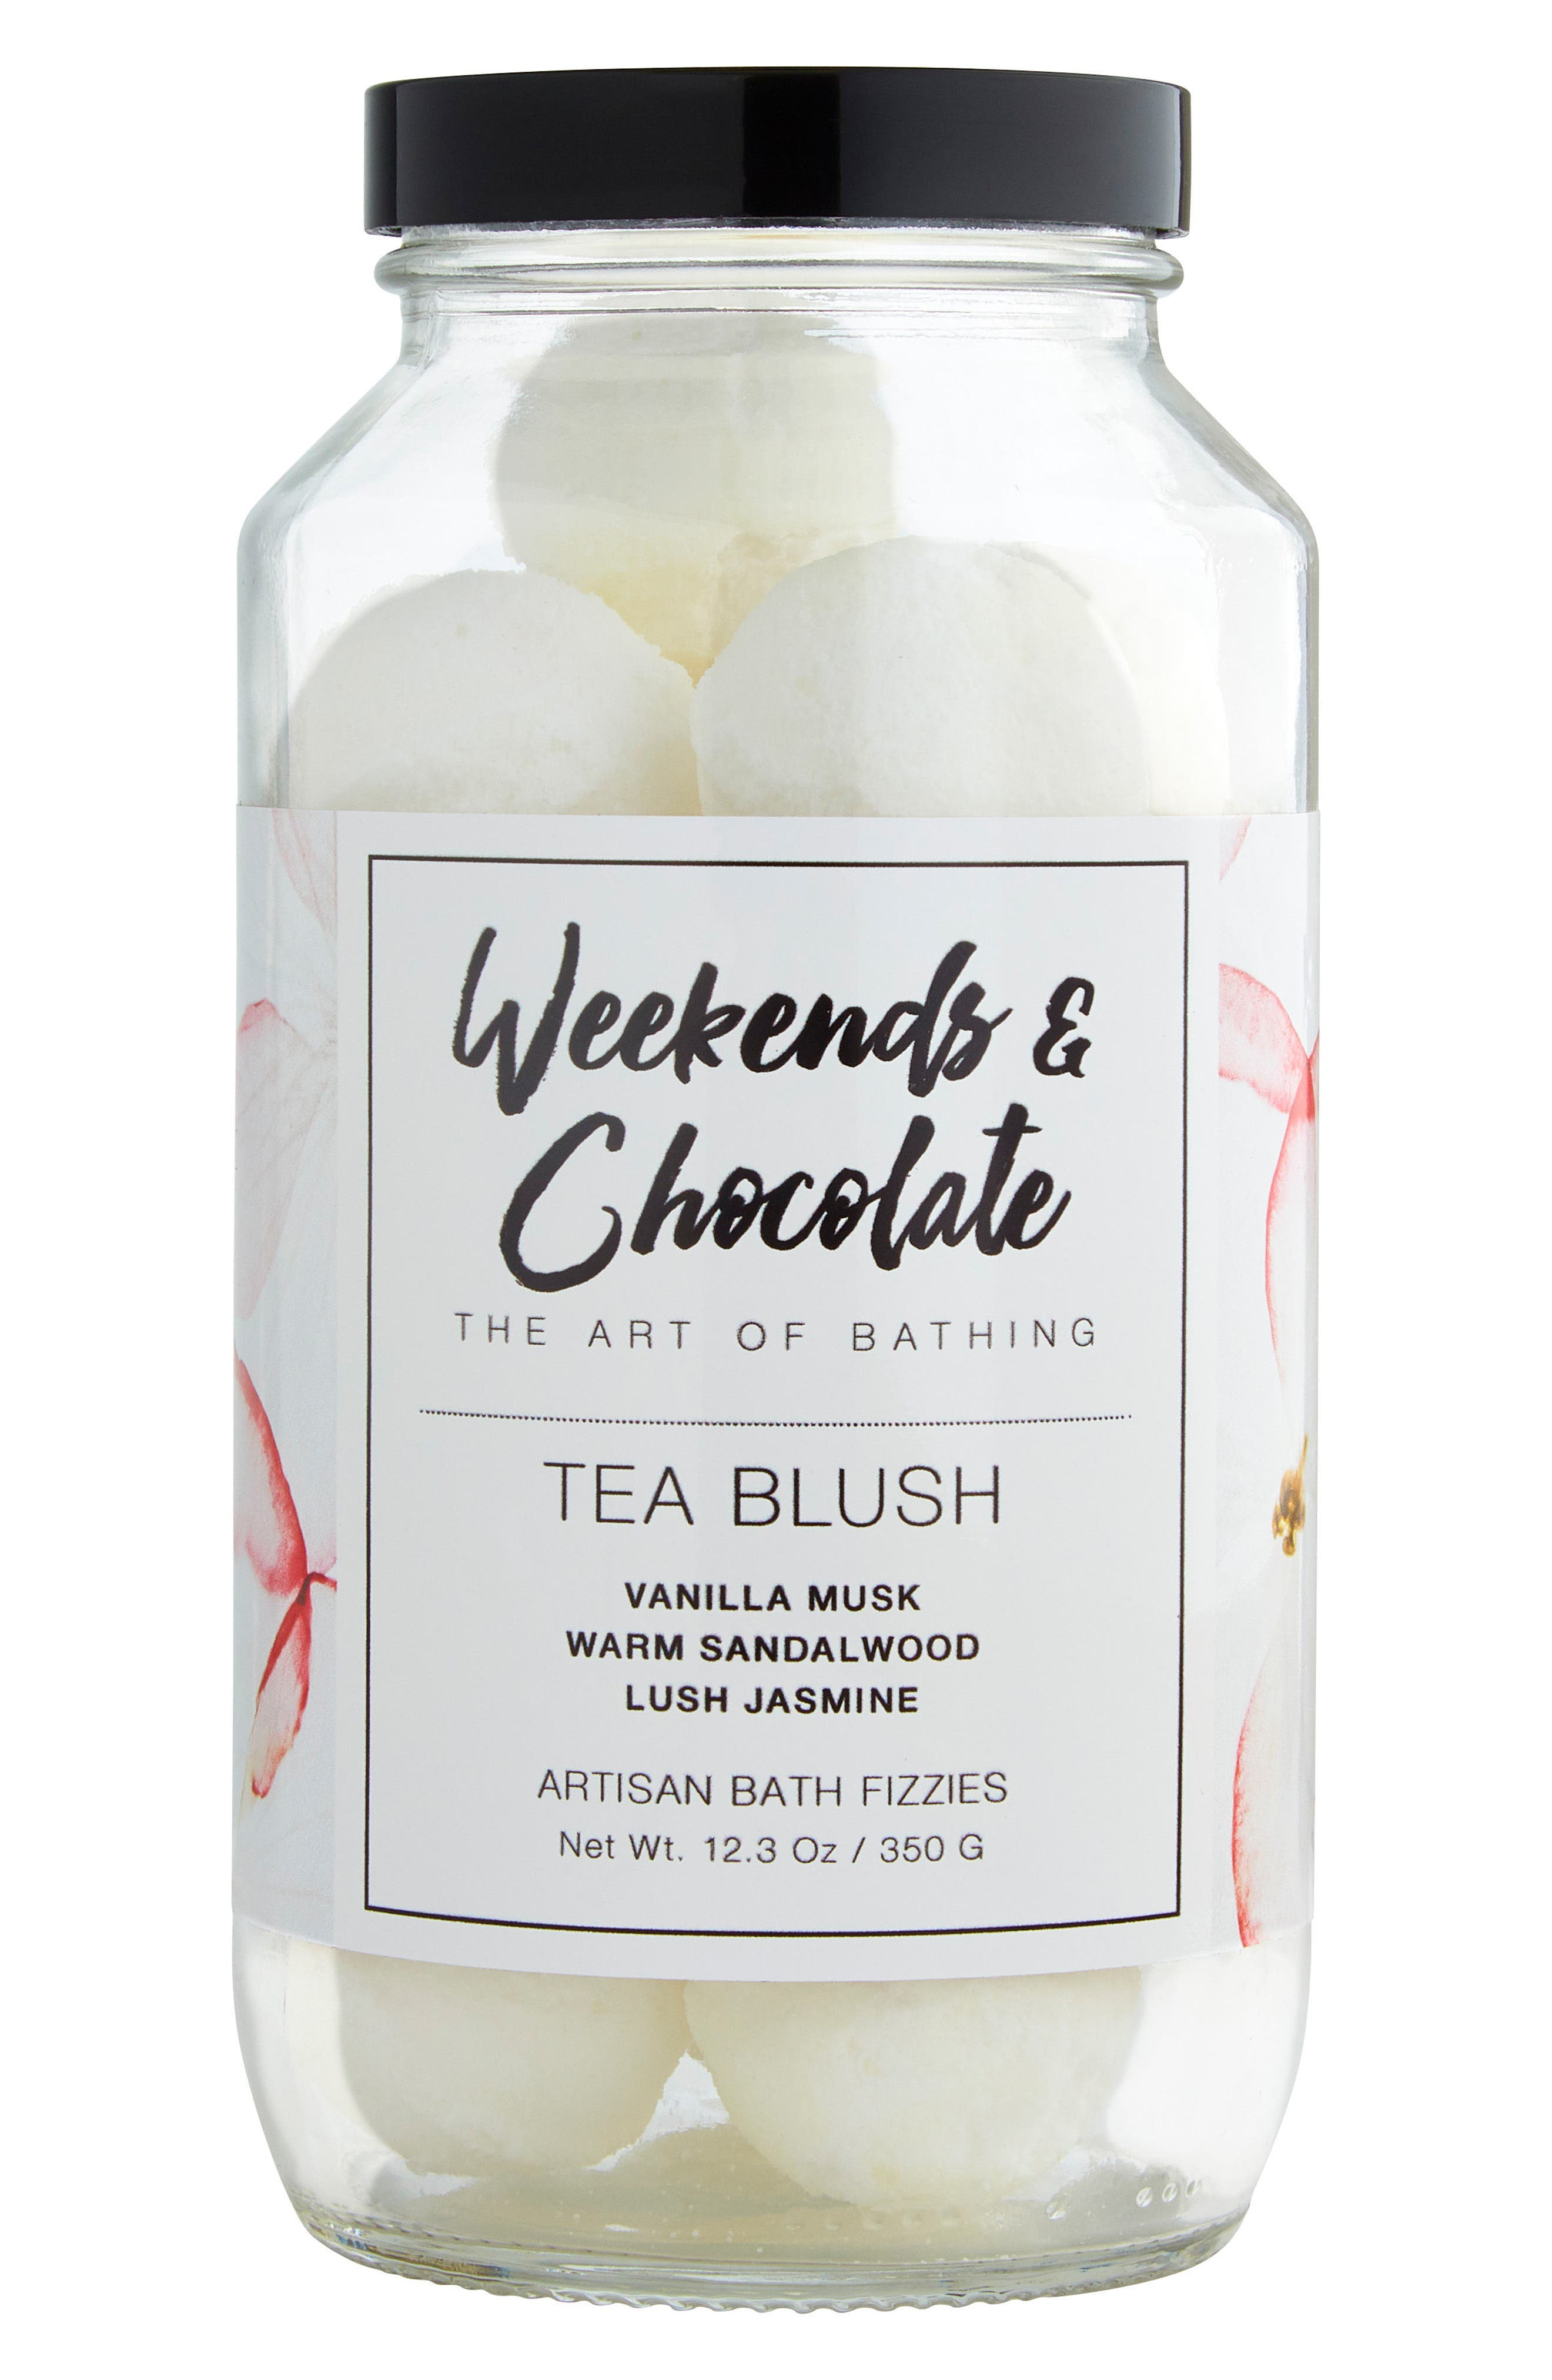 Weekends & Chocolate Tea Blush Bath Fizzies